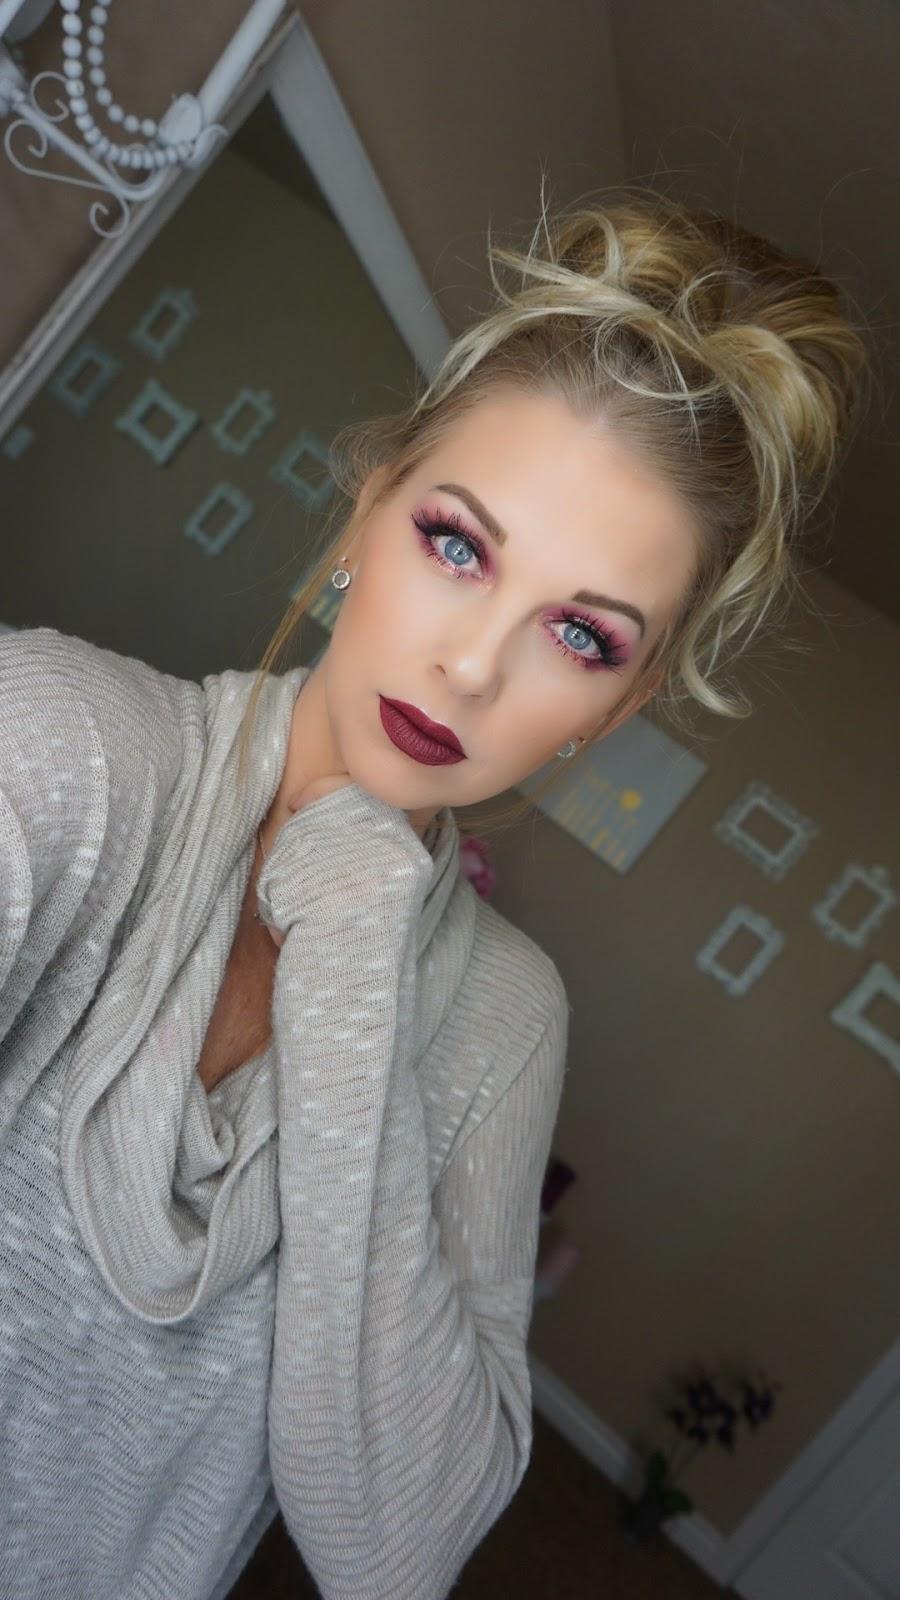 Colourpop Liquid Lip as Eyeshadow || justmelsdotcom